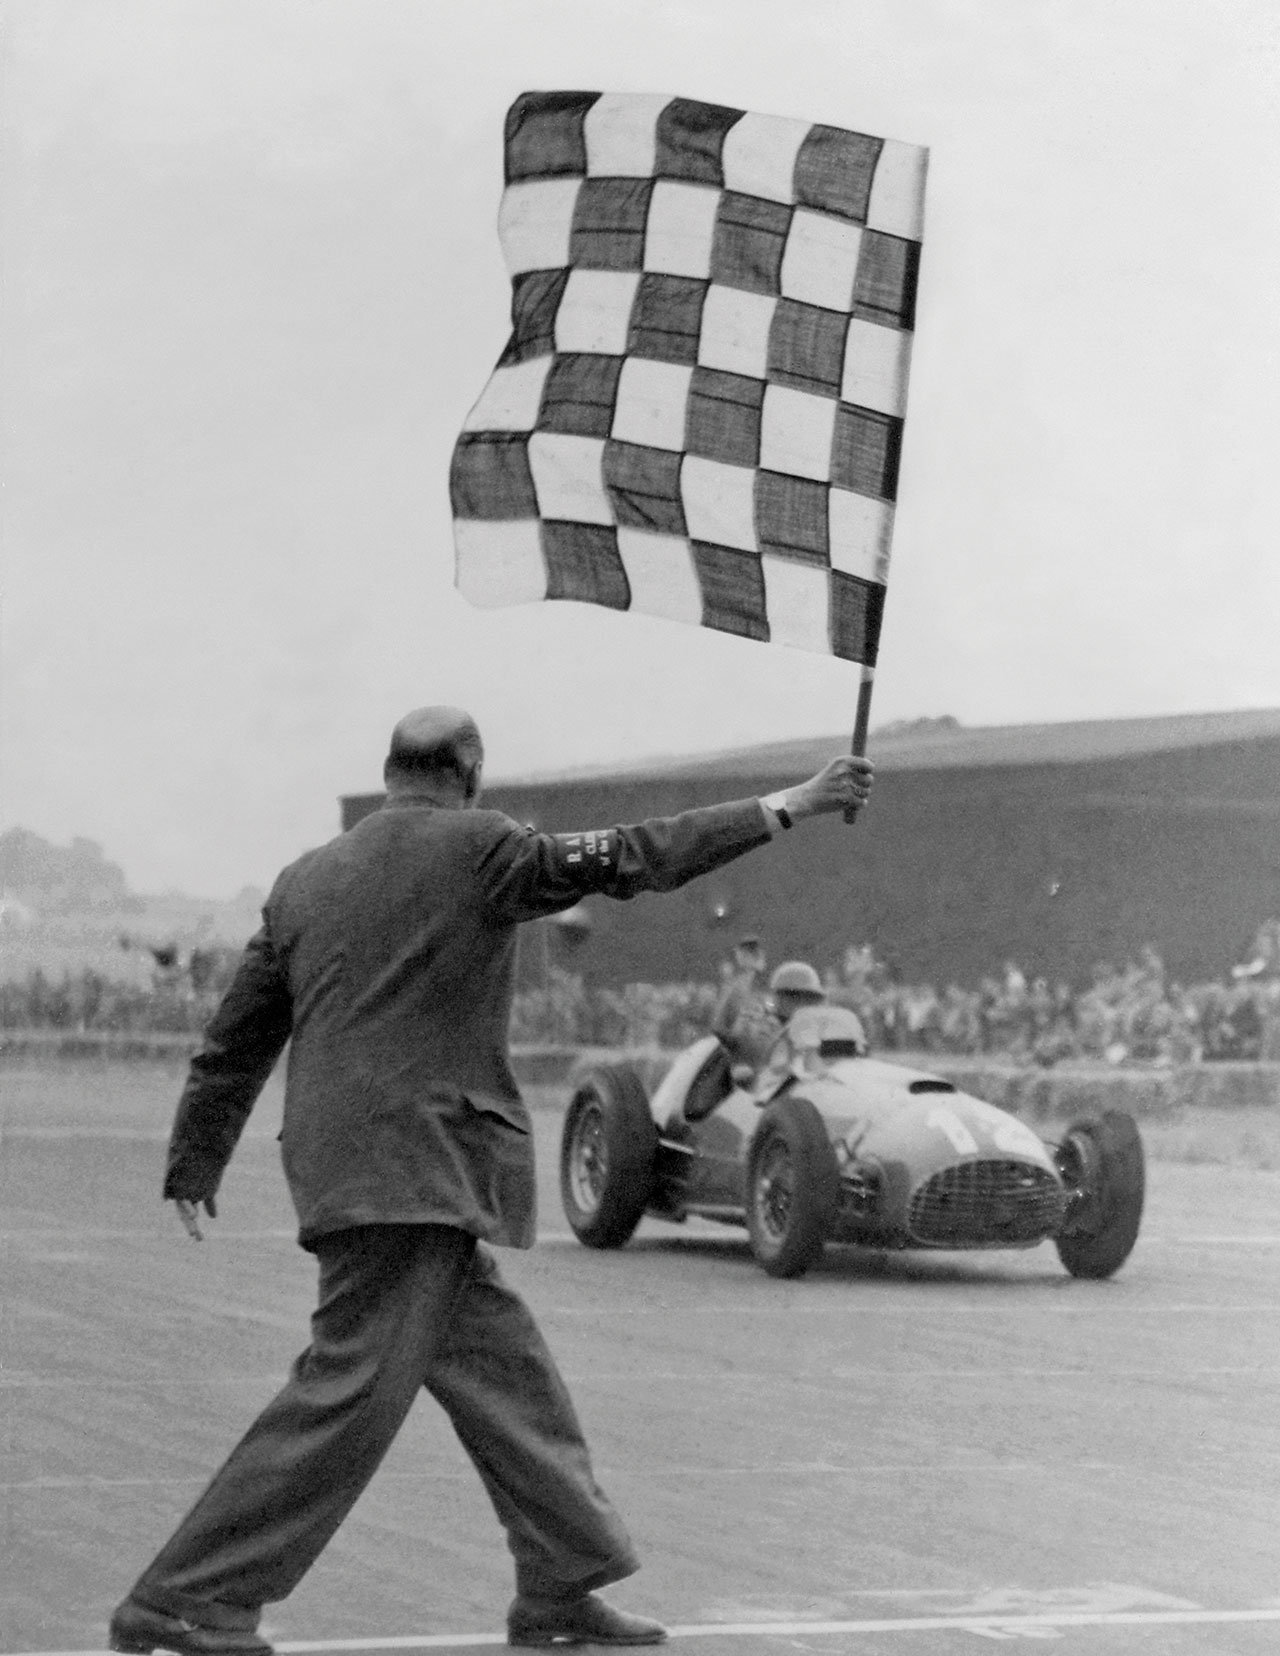 First Ferrari win in a GP valid for the Formula 1 World Championship, 1951. Photo courtesy of Ferrari.